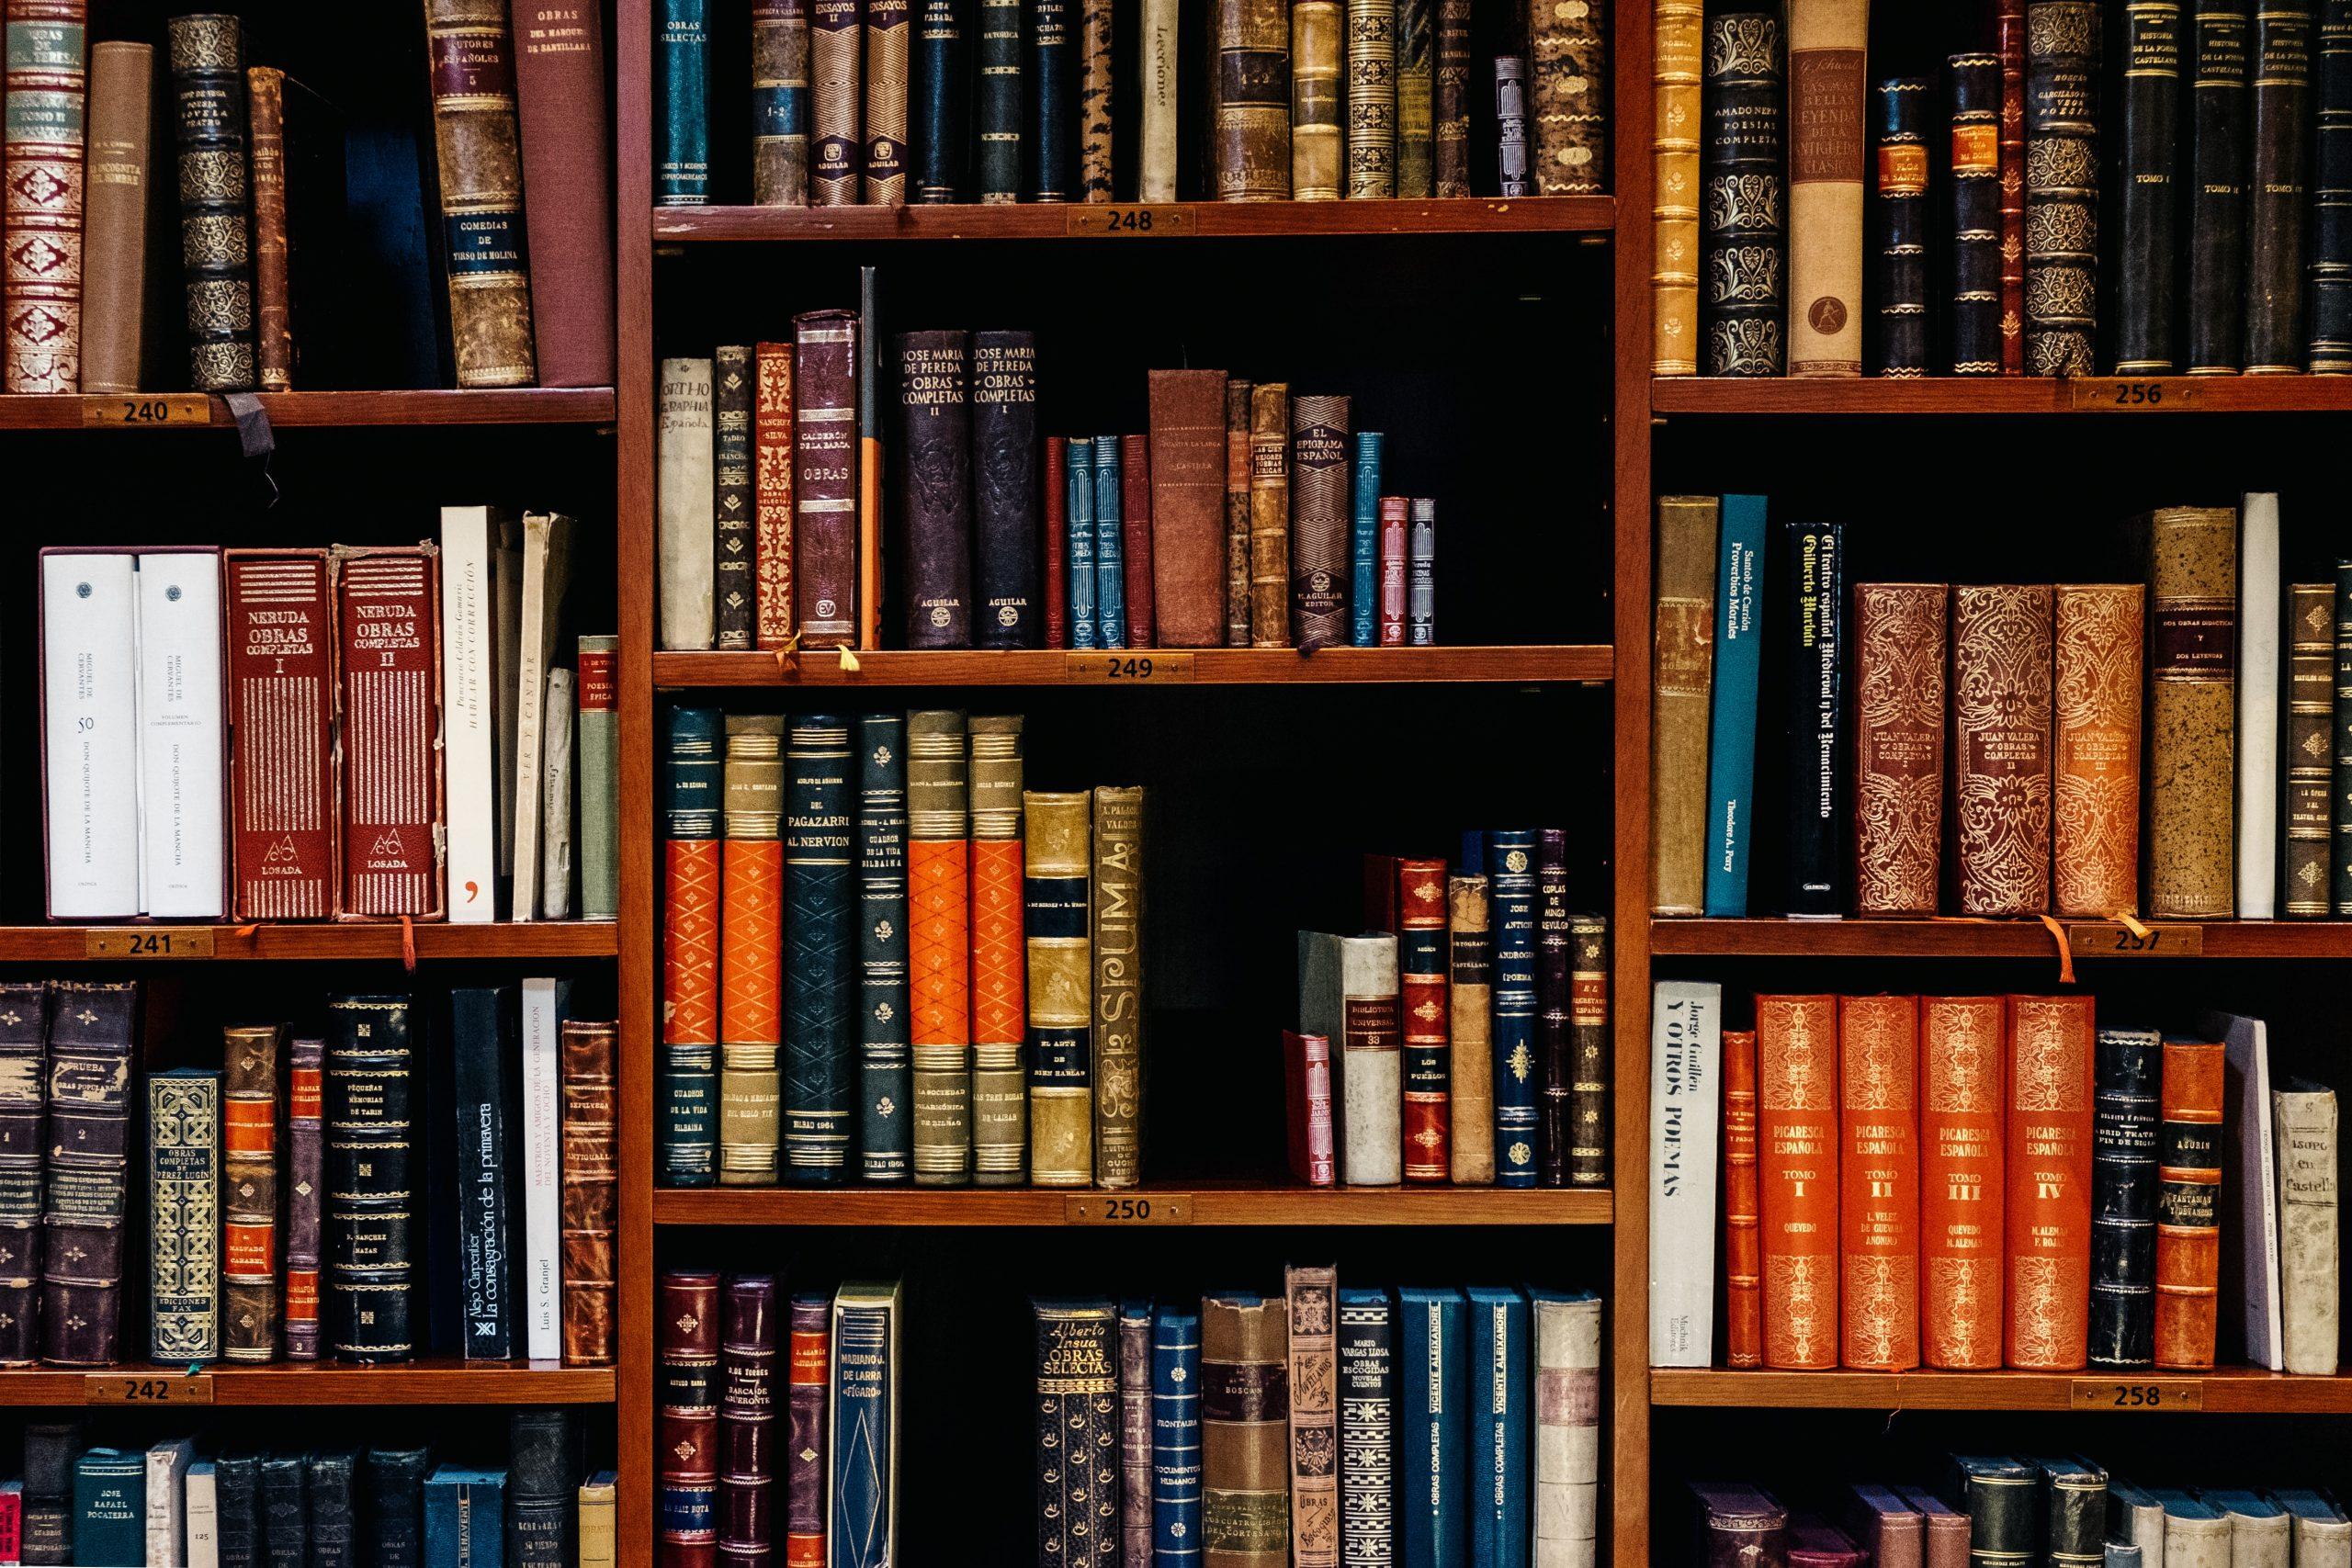 A bookshelf full of leather-bound books